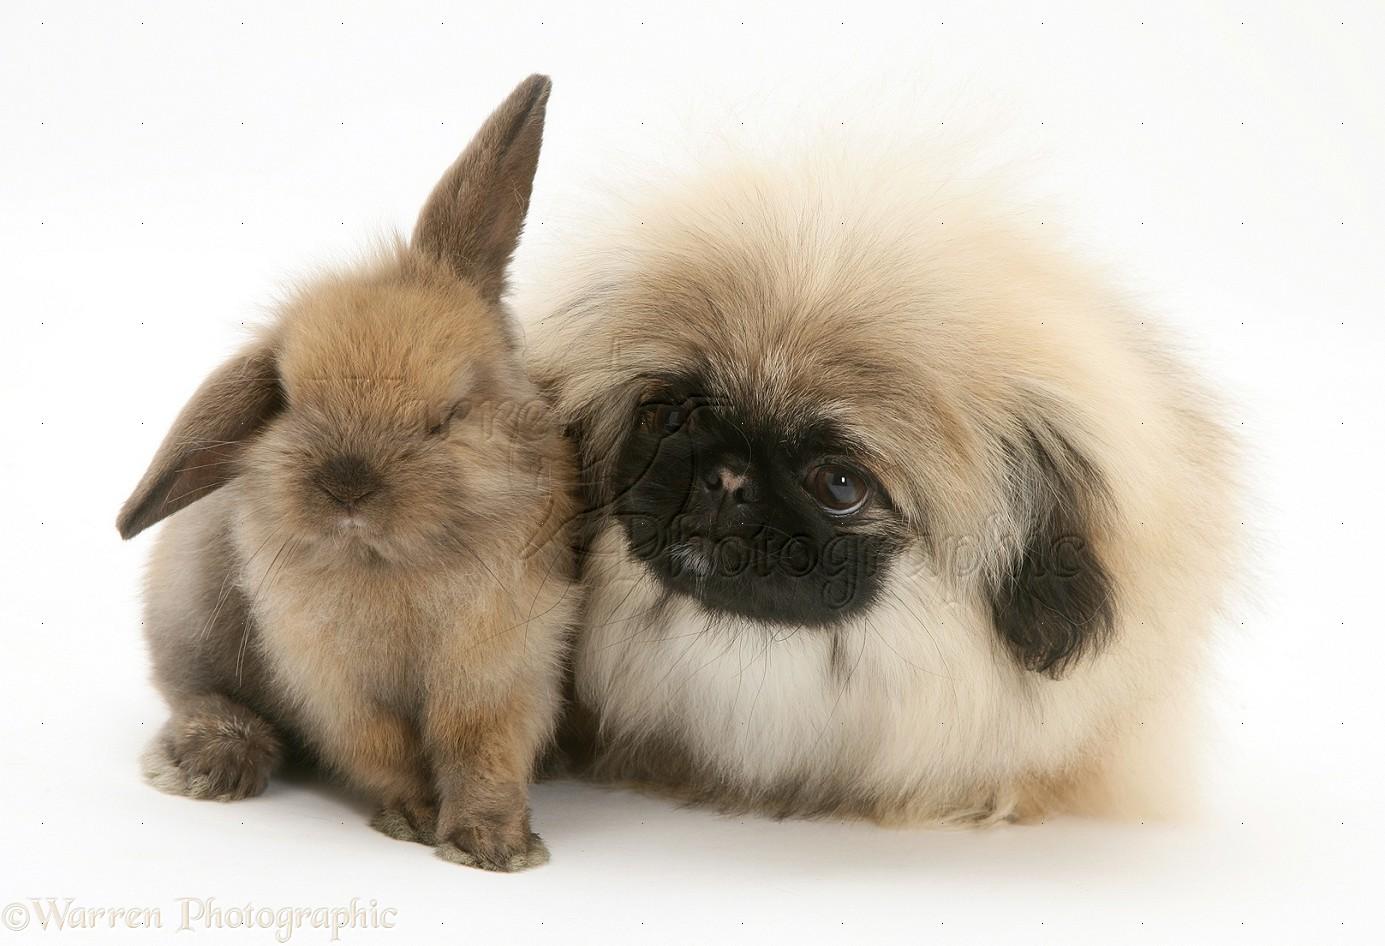 Pets: Pekingese pup and baby Lop rabbit photo WP17899